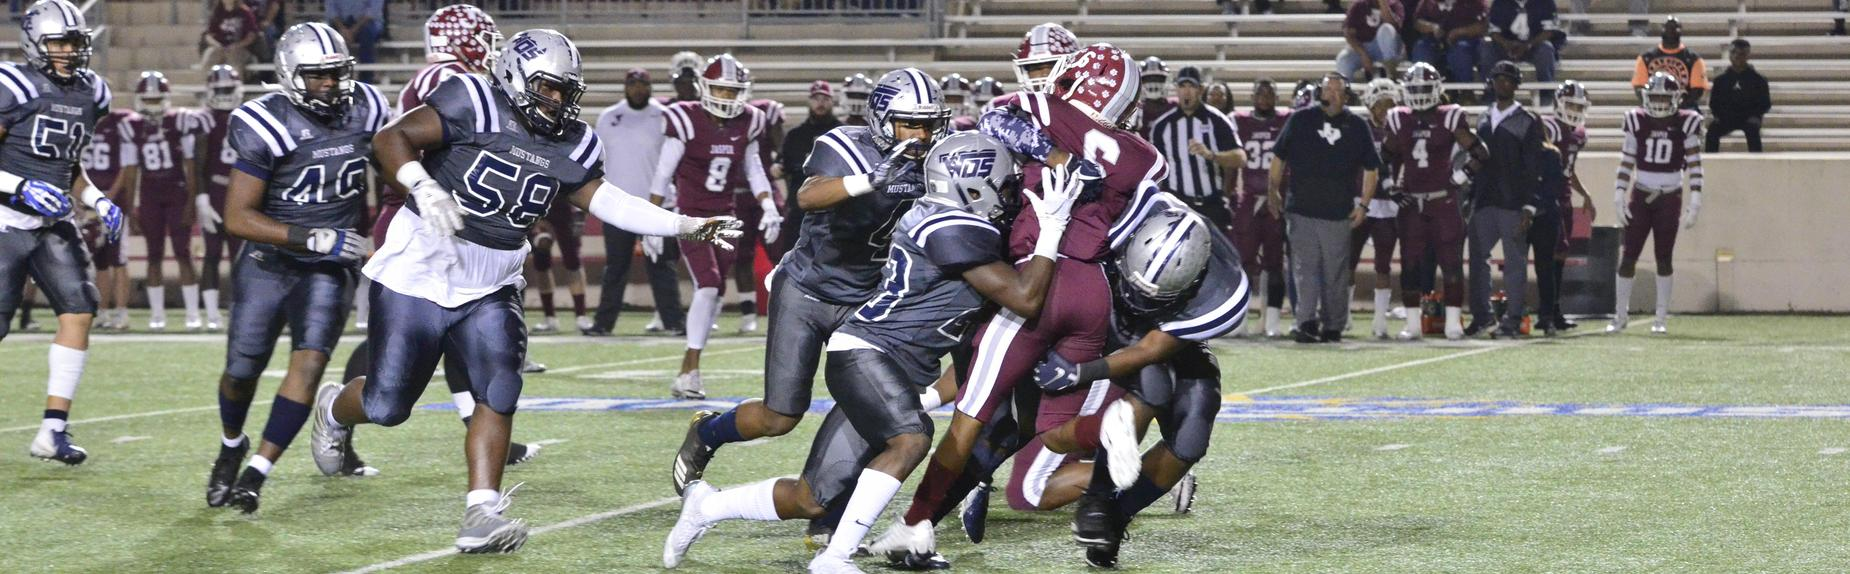 The Mustang defense takes down the Jasper quarterback!